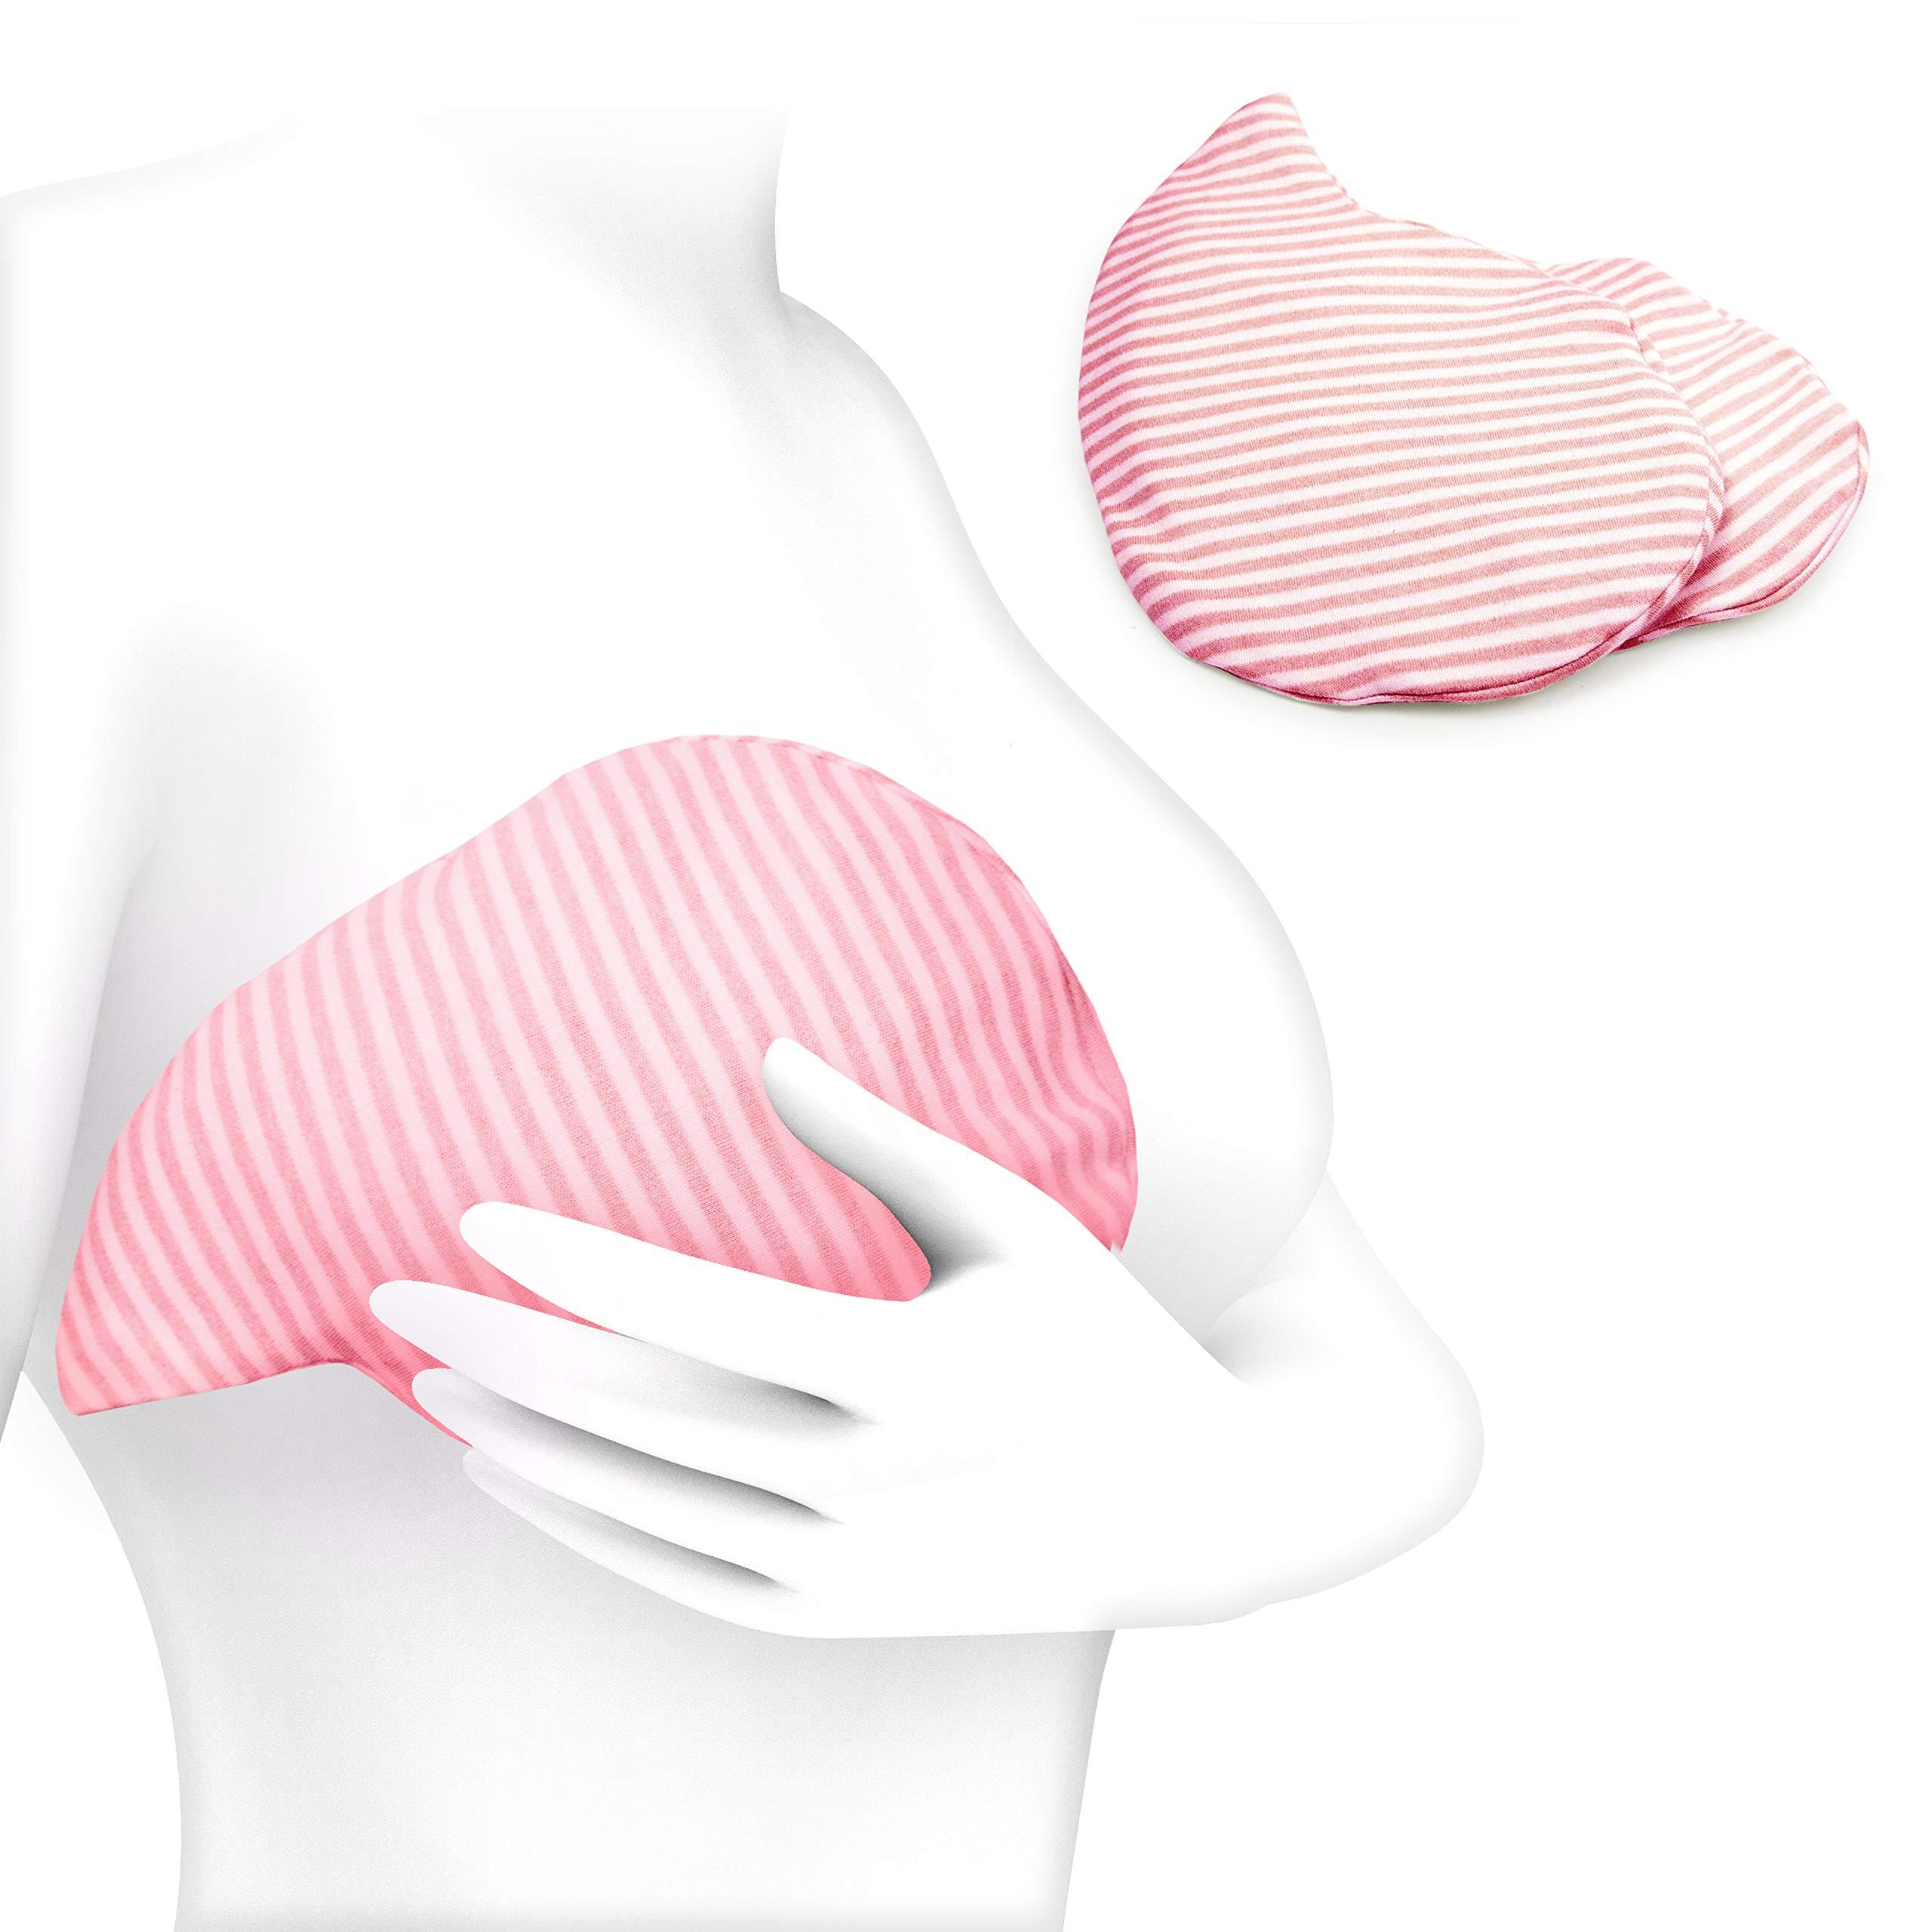 Luxury Breast Gel Packs by Magic Gel - Use as a Breast Ice Pack or a Breastfeeding Heating pad.